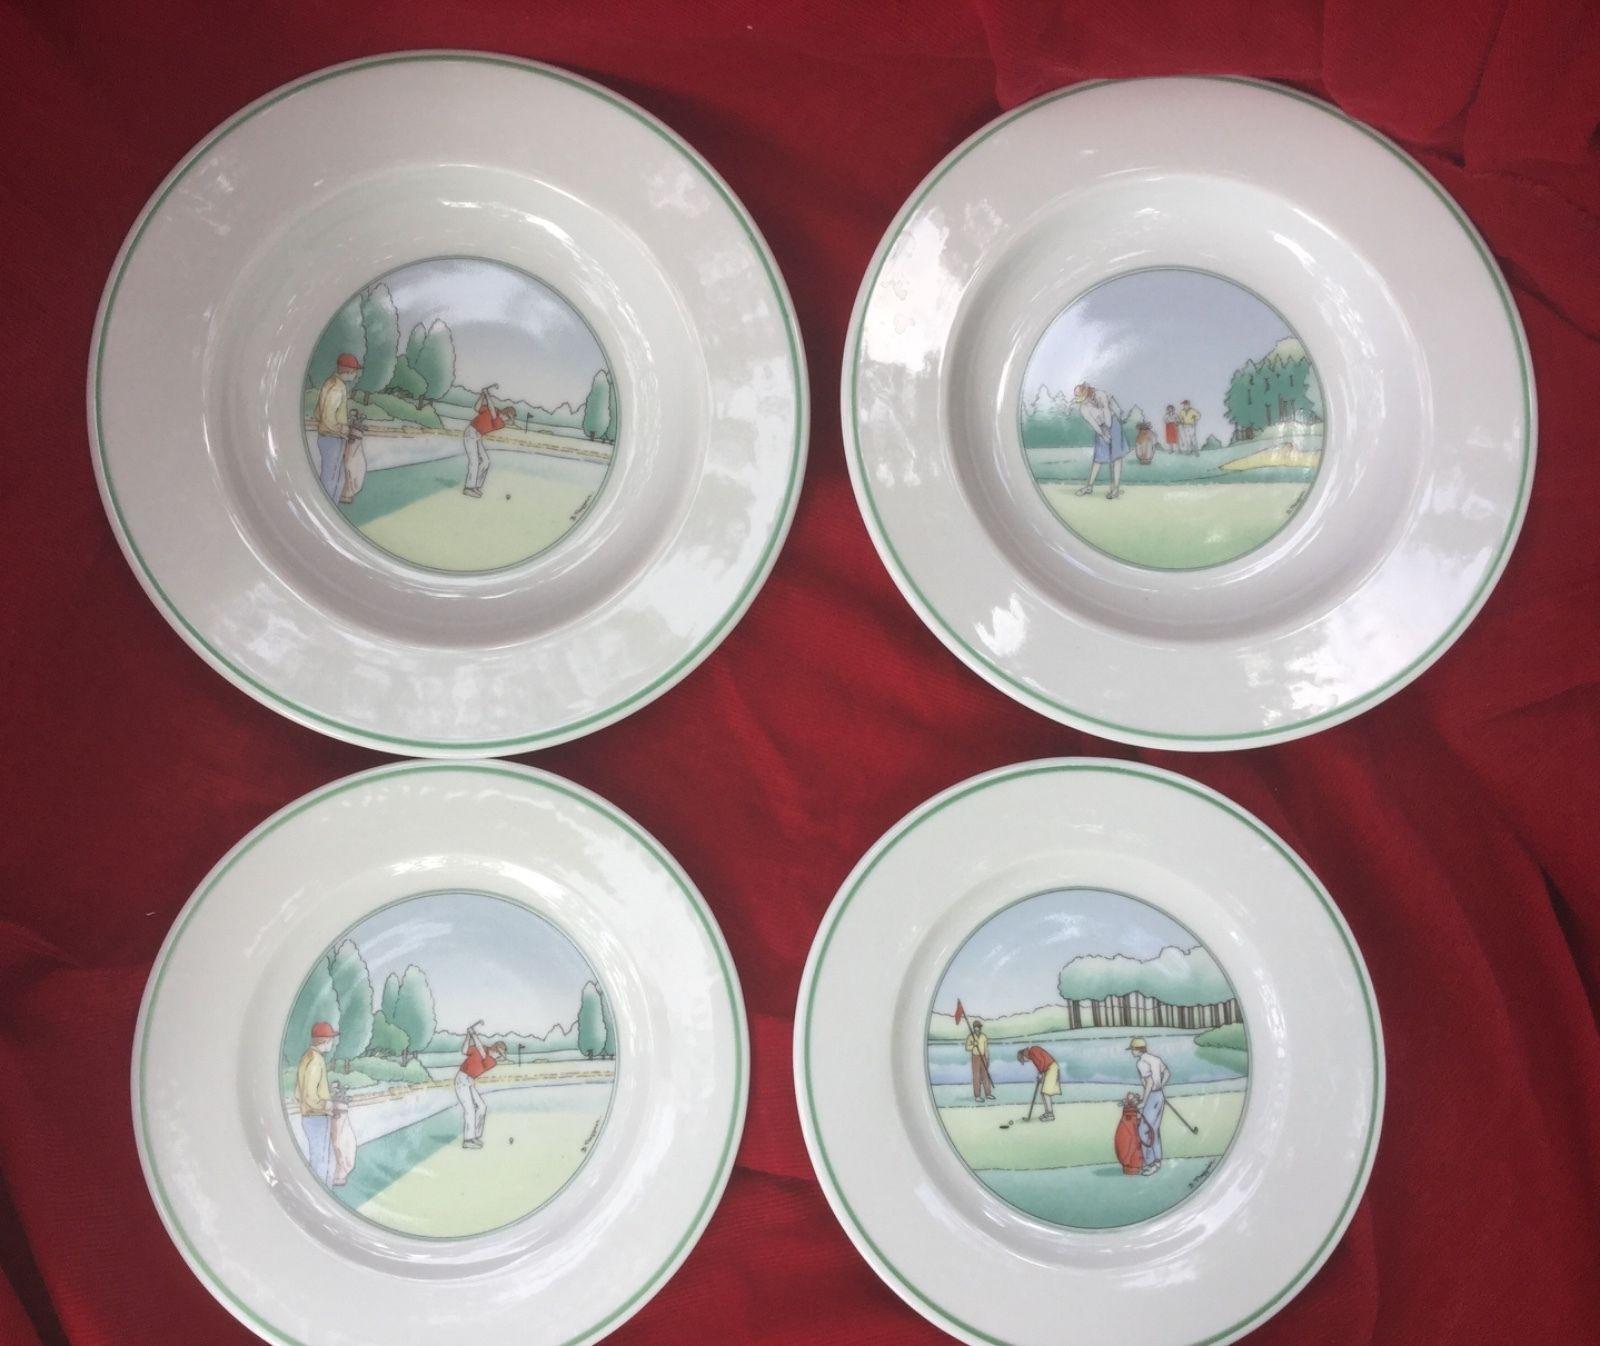 Apilco France Plates Set of 4 Decor and 50 similar items